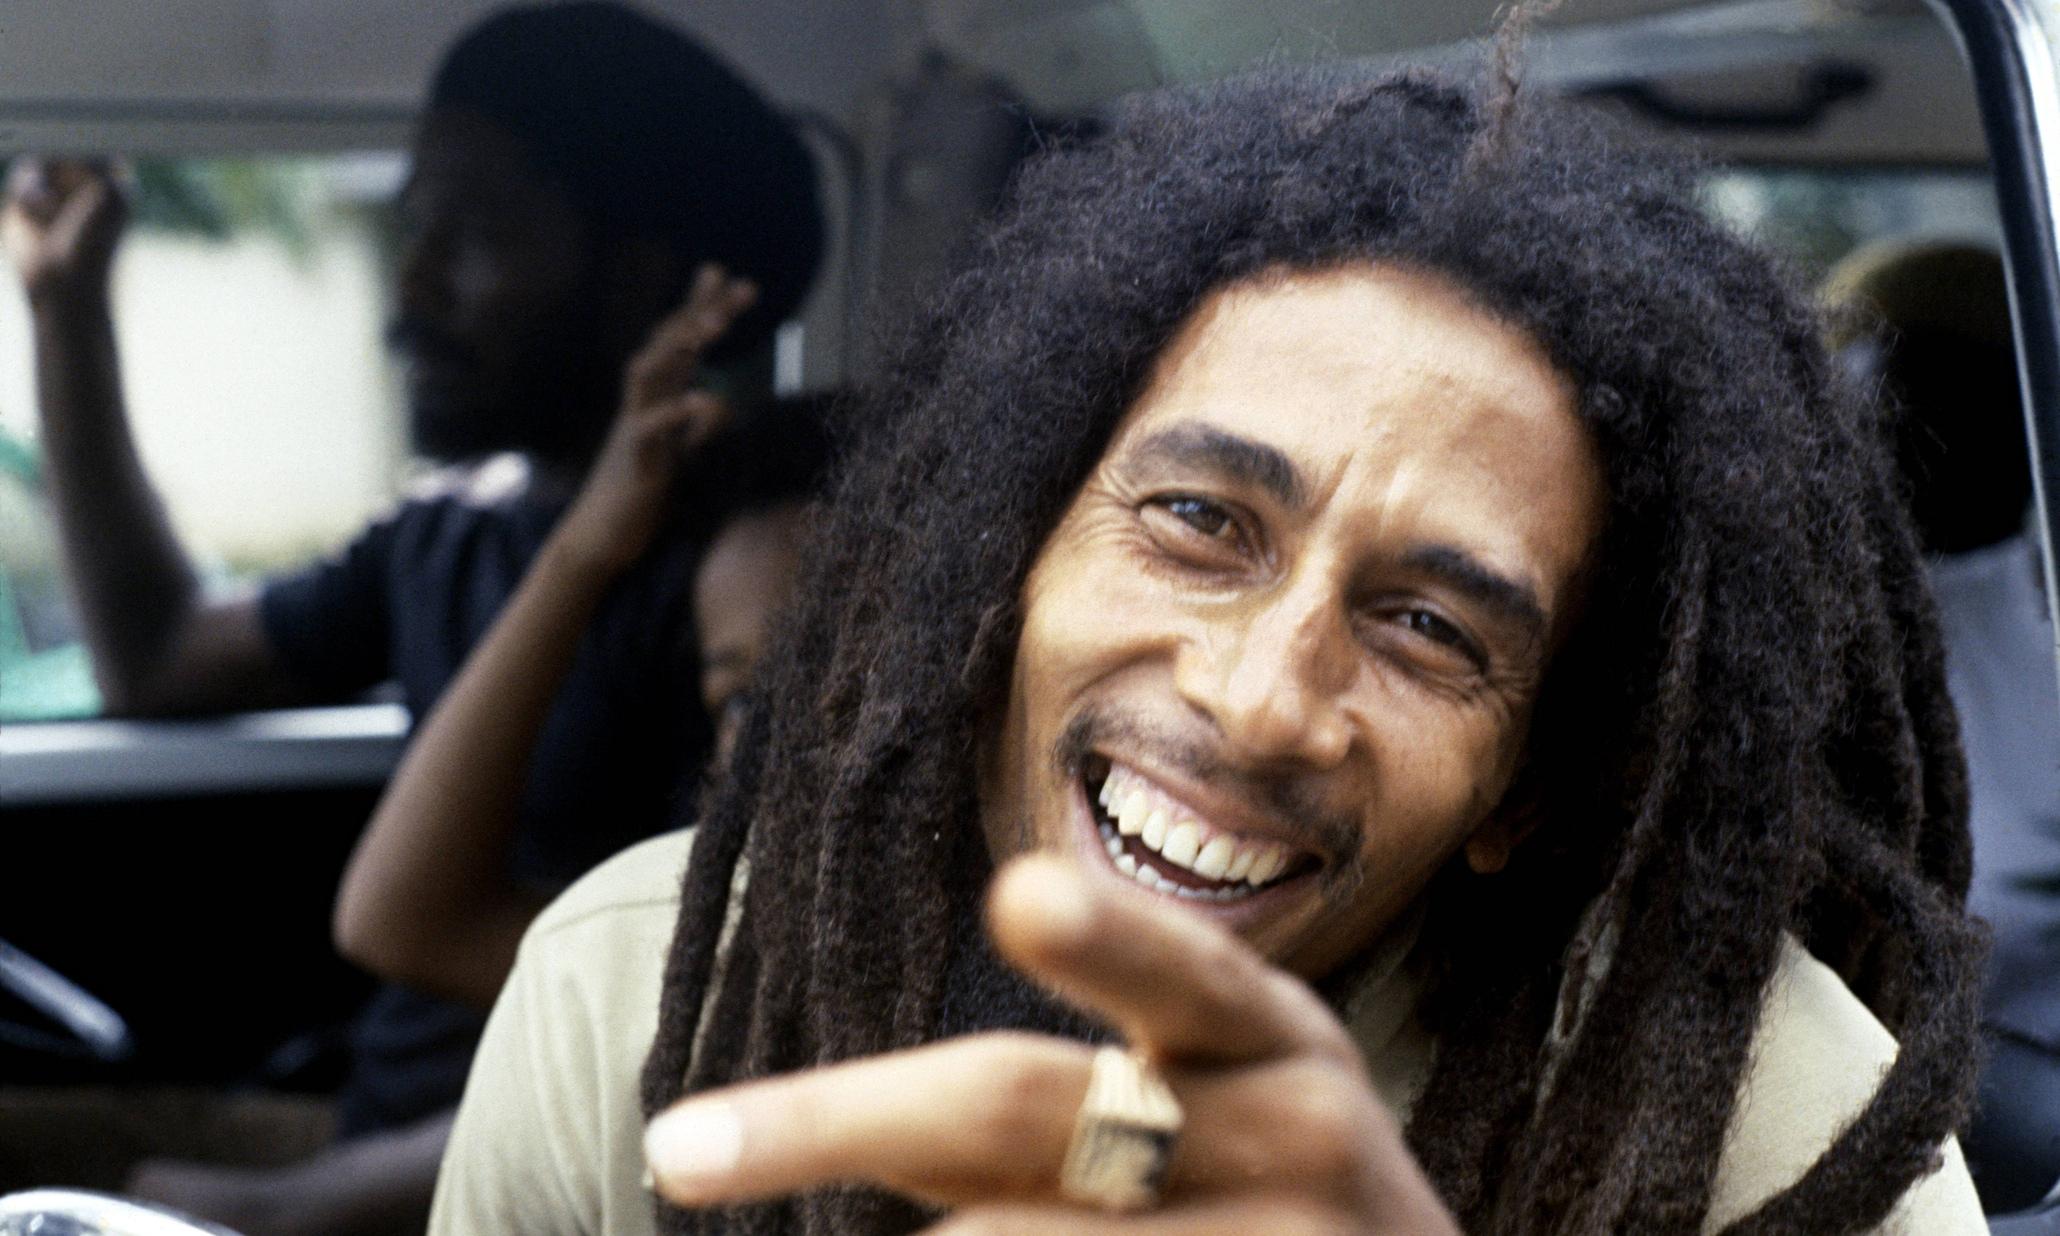 Bob Marley: Bob Marley At 70: Legend And Legacy